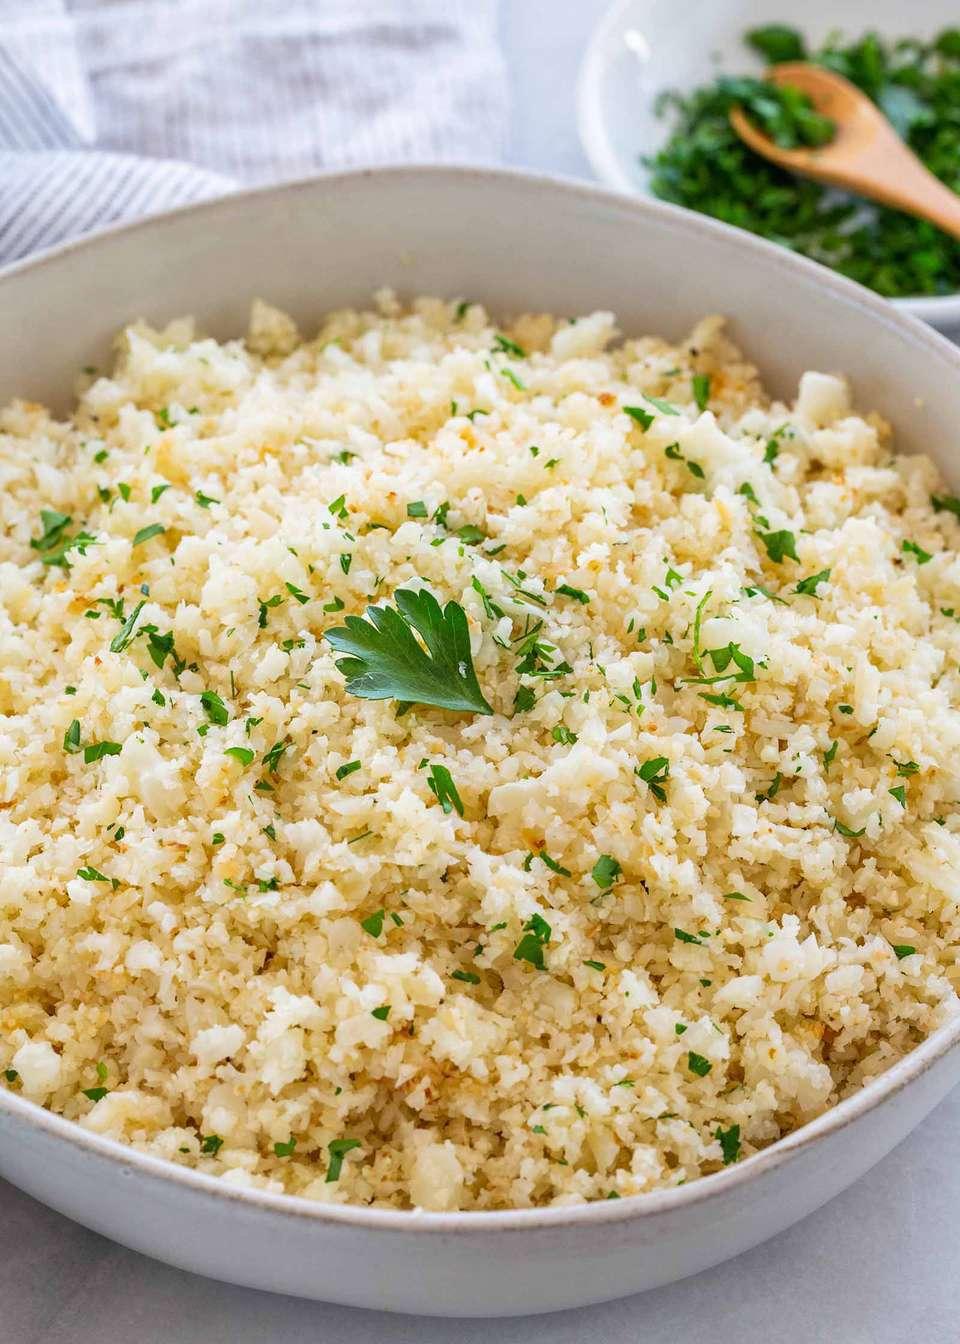 How to Make Rice from Cauliflower